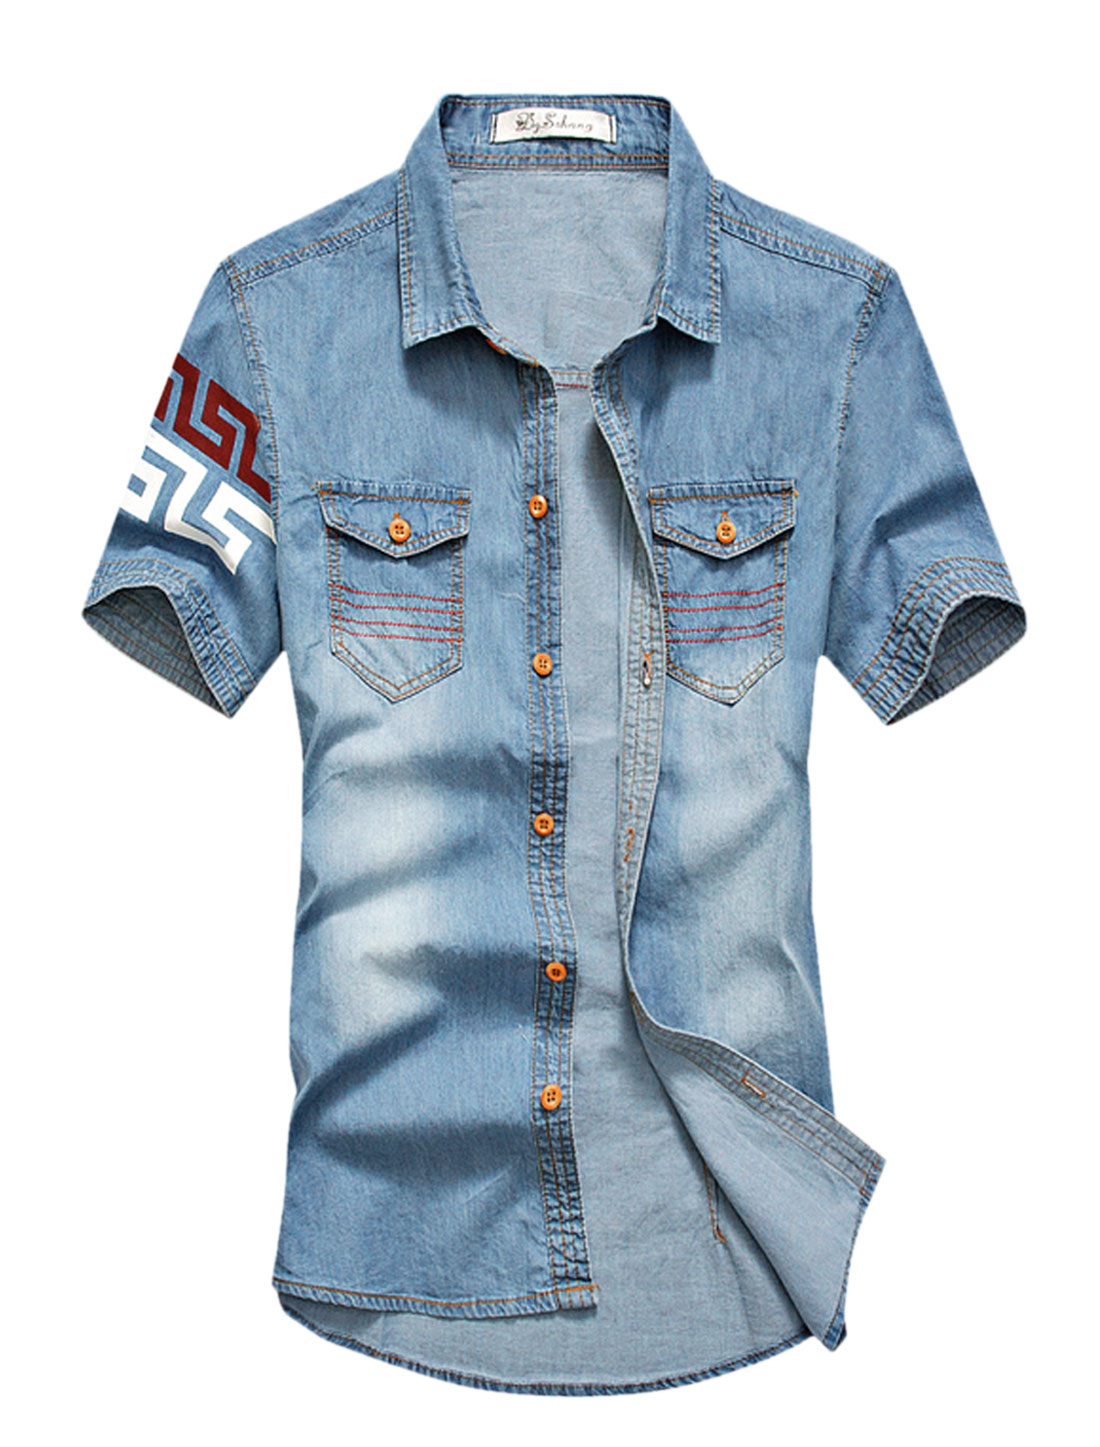 Men Novelty Prints Detail Flap Pockets Front Denim Shirt Dark Blues